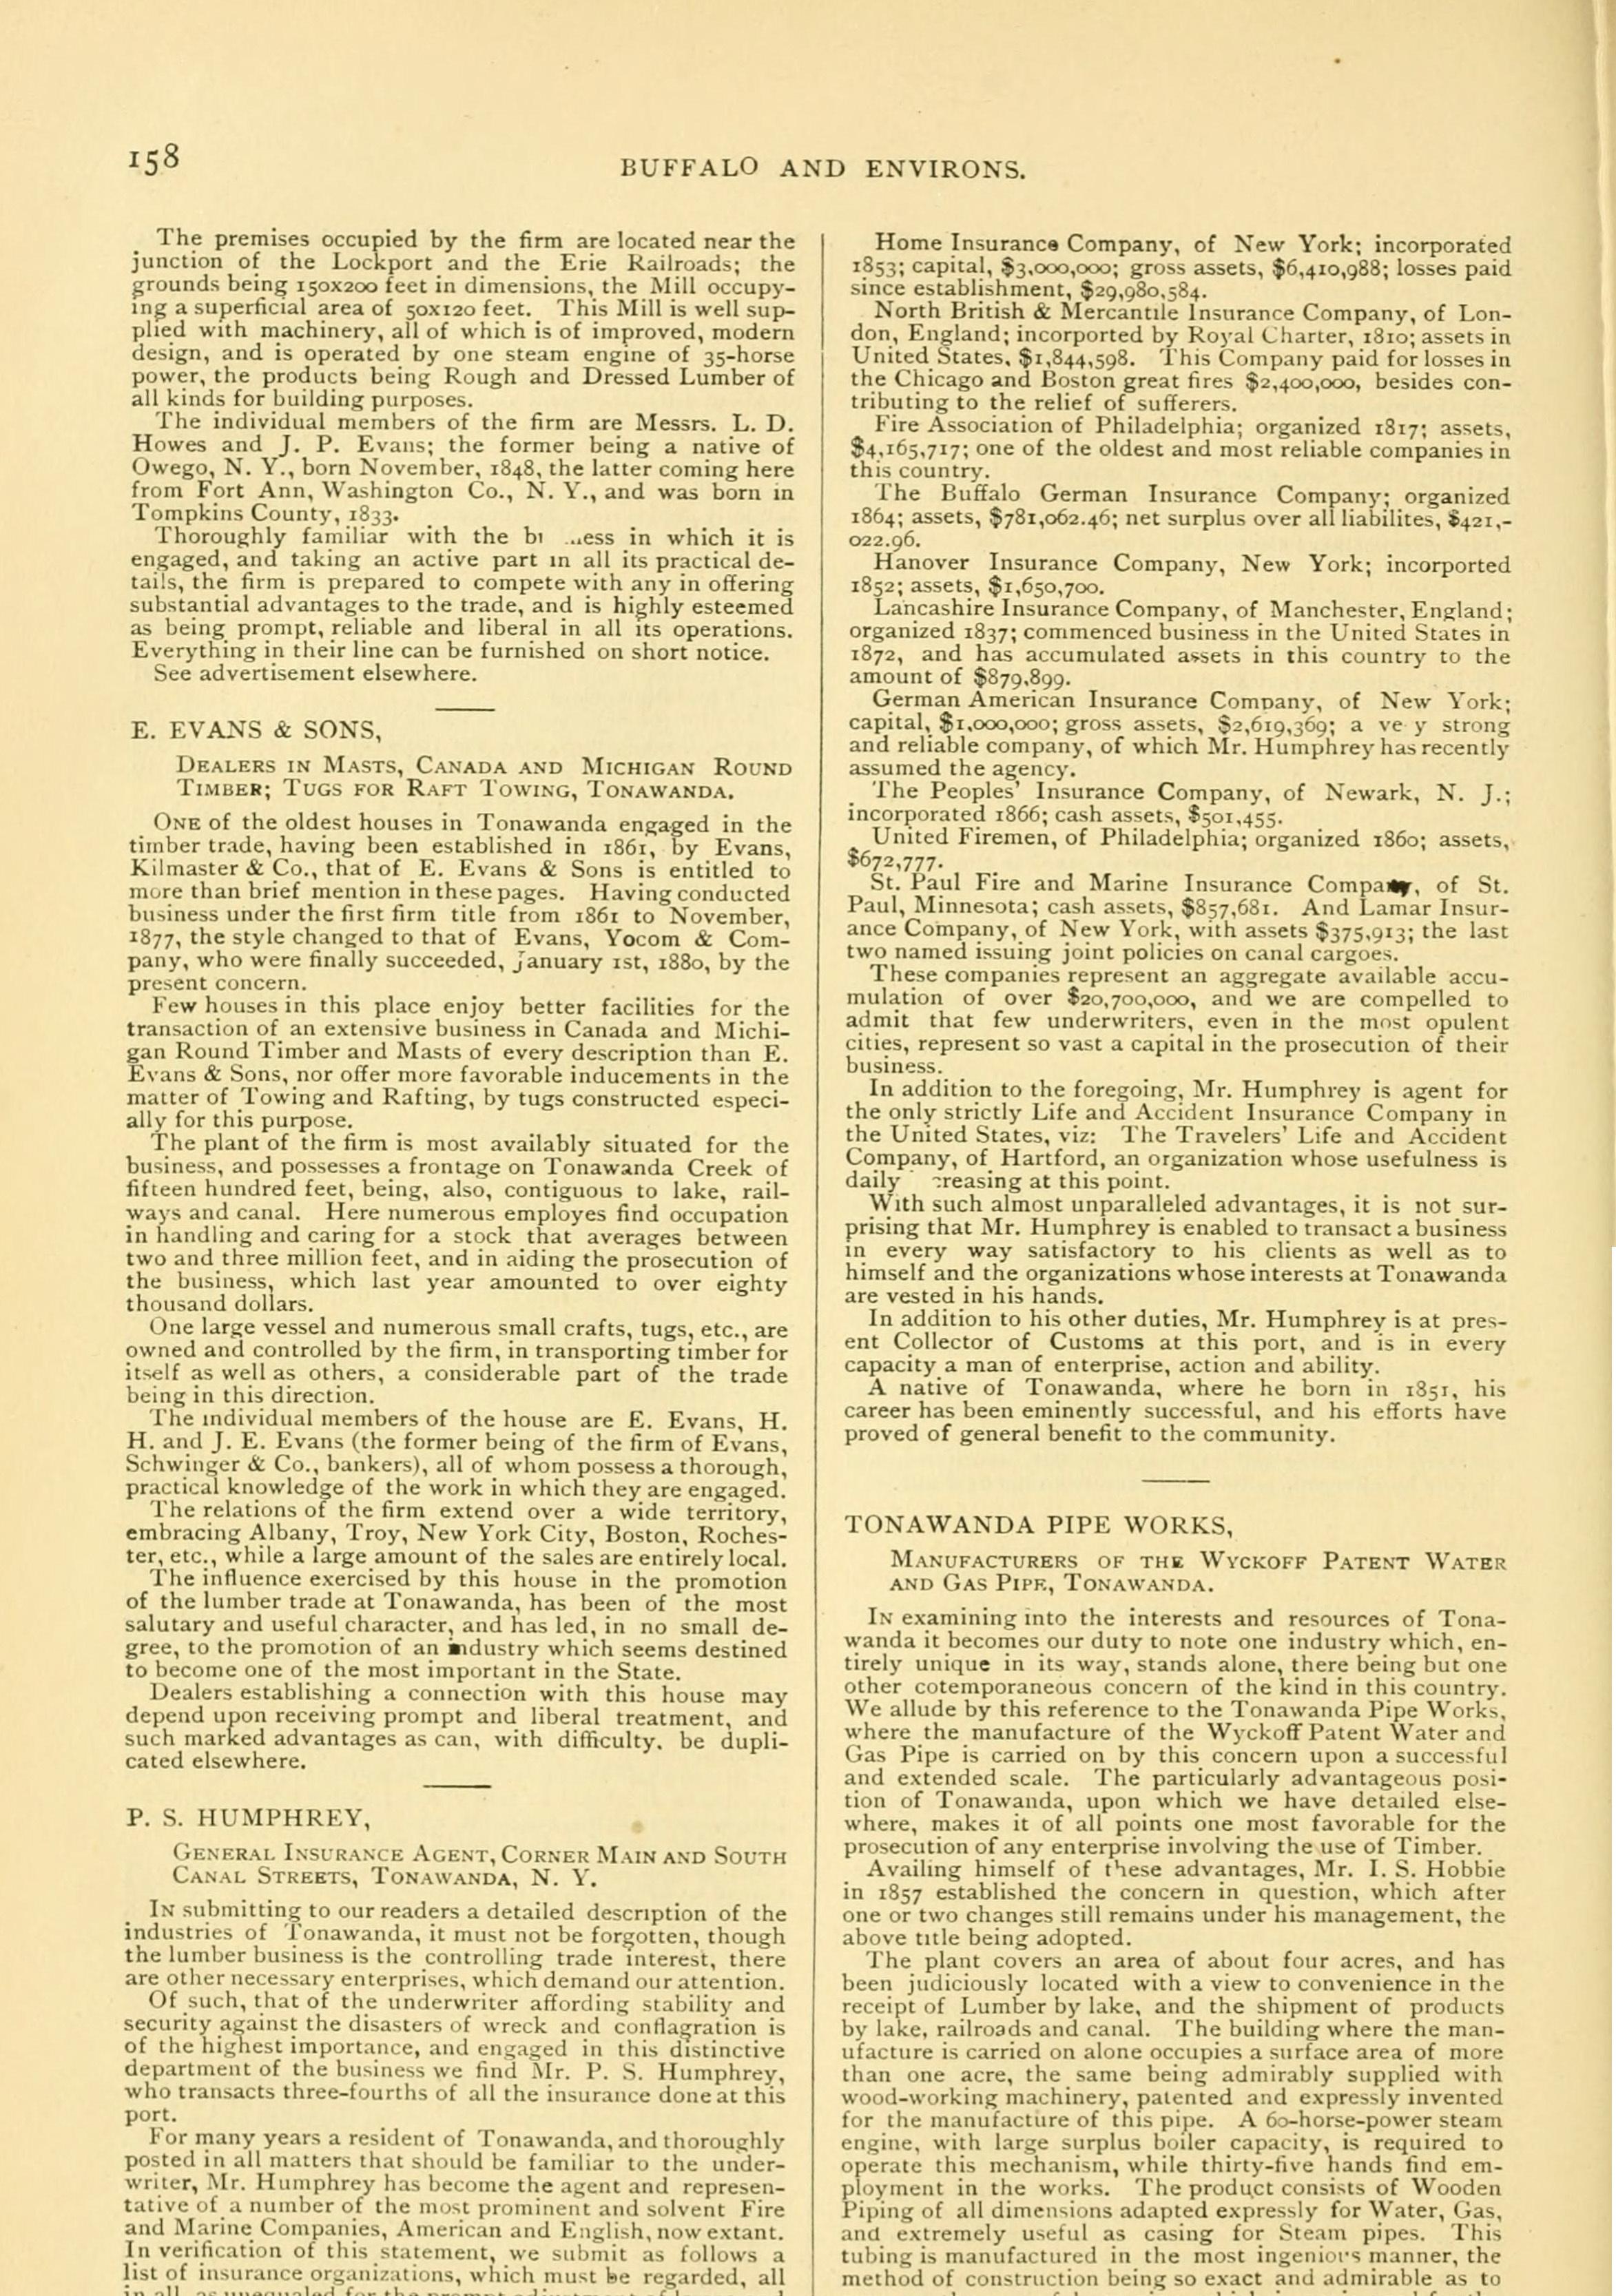 Tonawanda, book excerpt (Commerce, 1880) p158.jpg